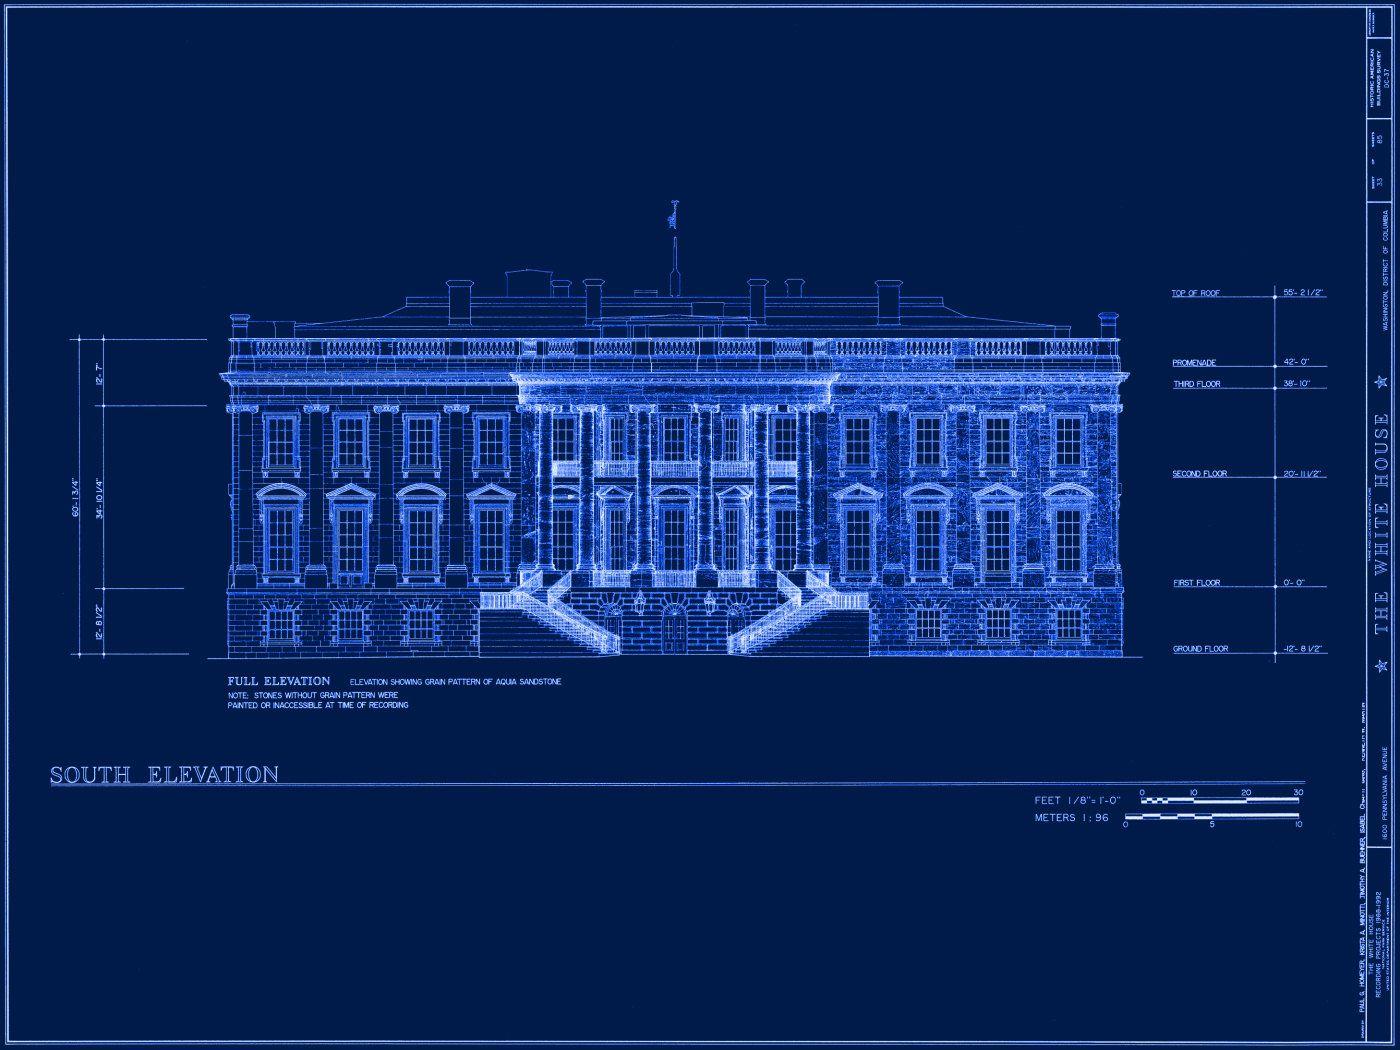 White House Diagram Horton C2150 Wiring Blue Print 14001050 Blueprints Pinterest